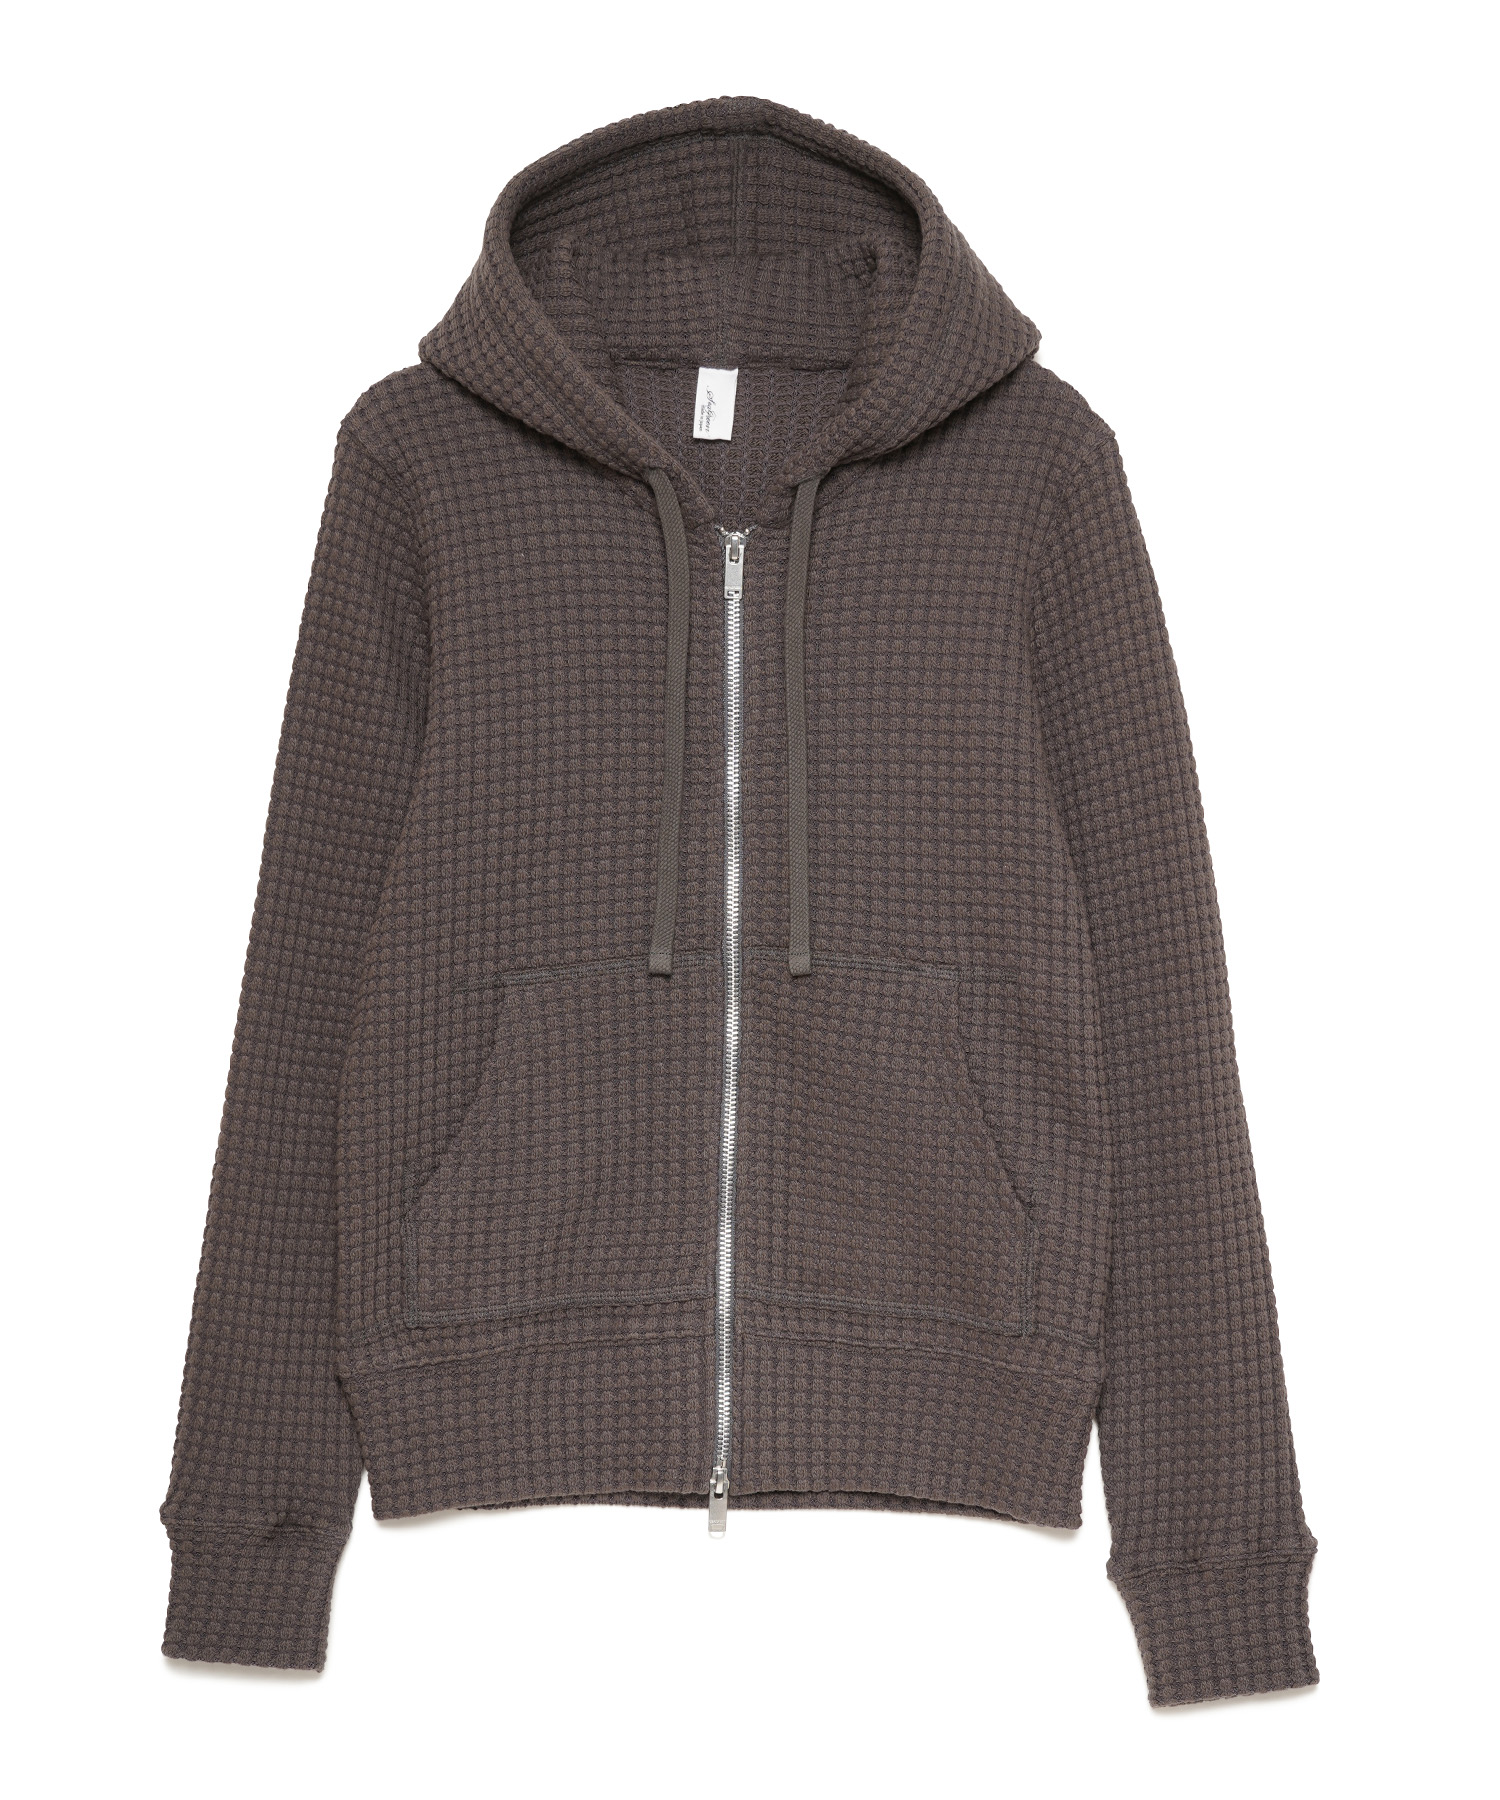 Seagreen BIG WAFFLE hoodie